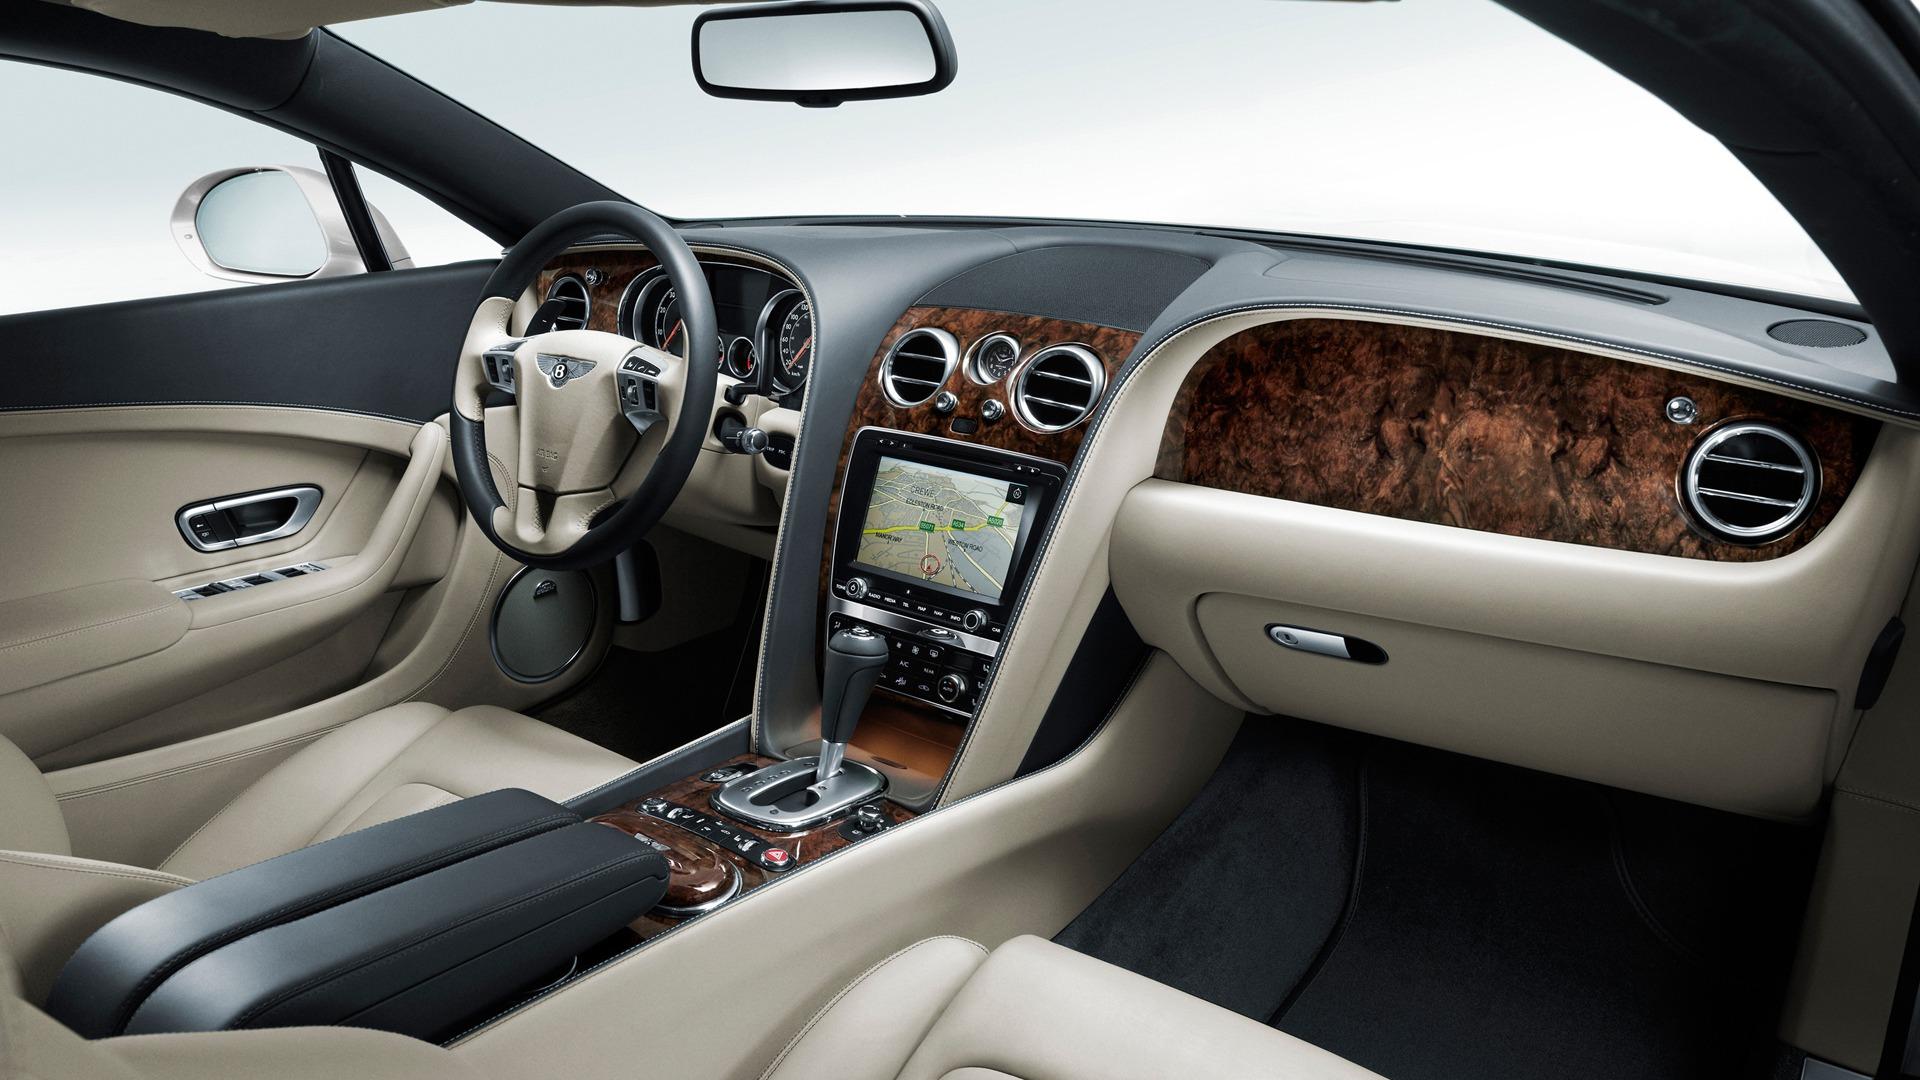 Bentley Continental Gt 2010 Hd Wallpaper 36 1920x1080